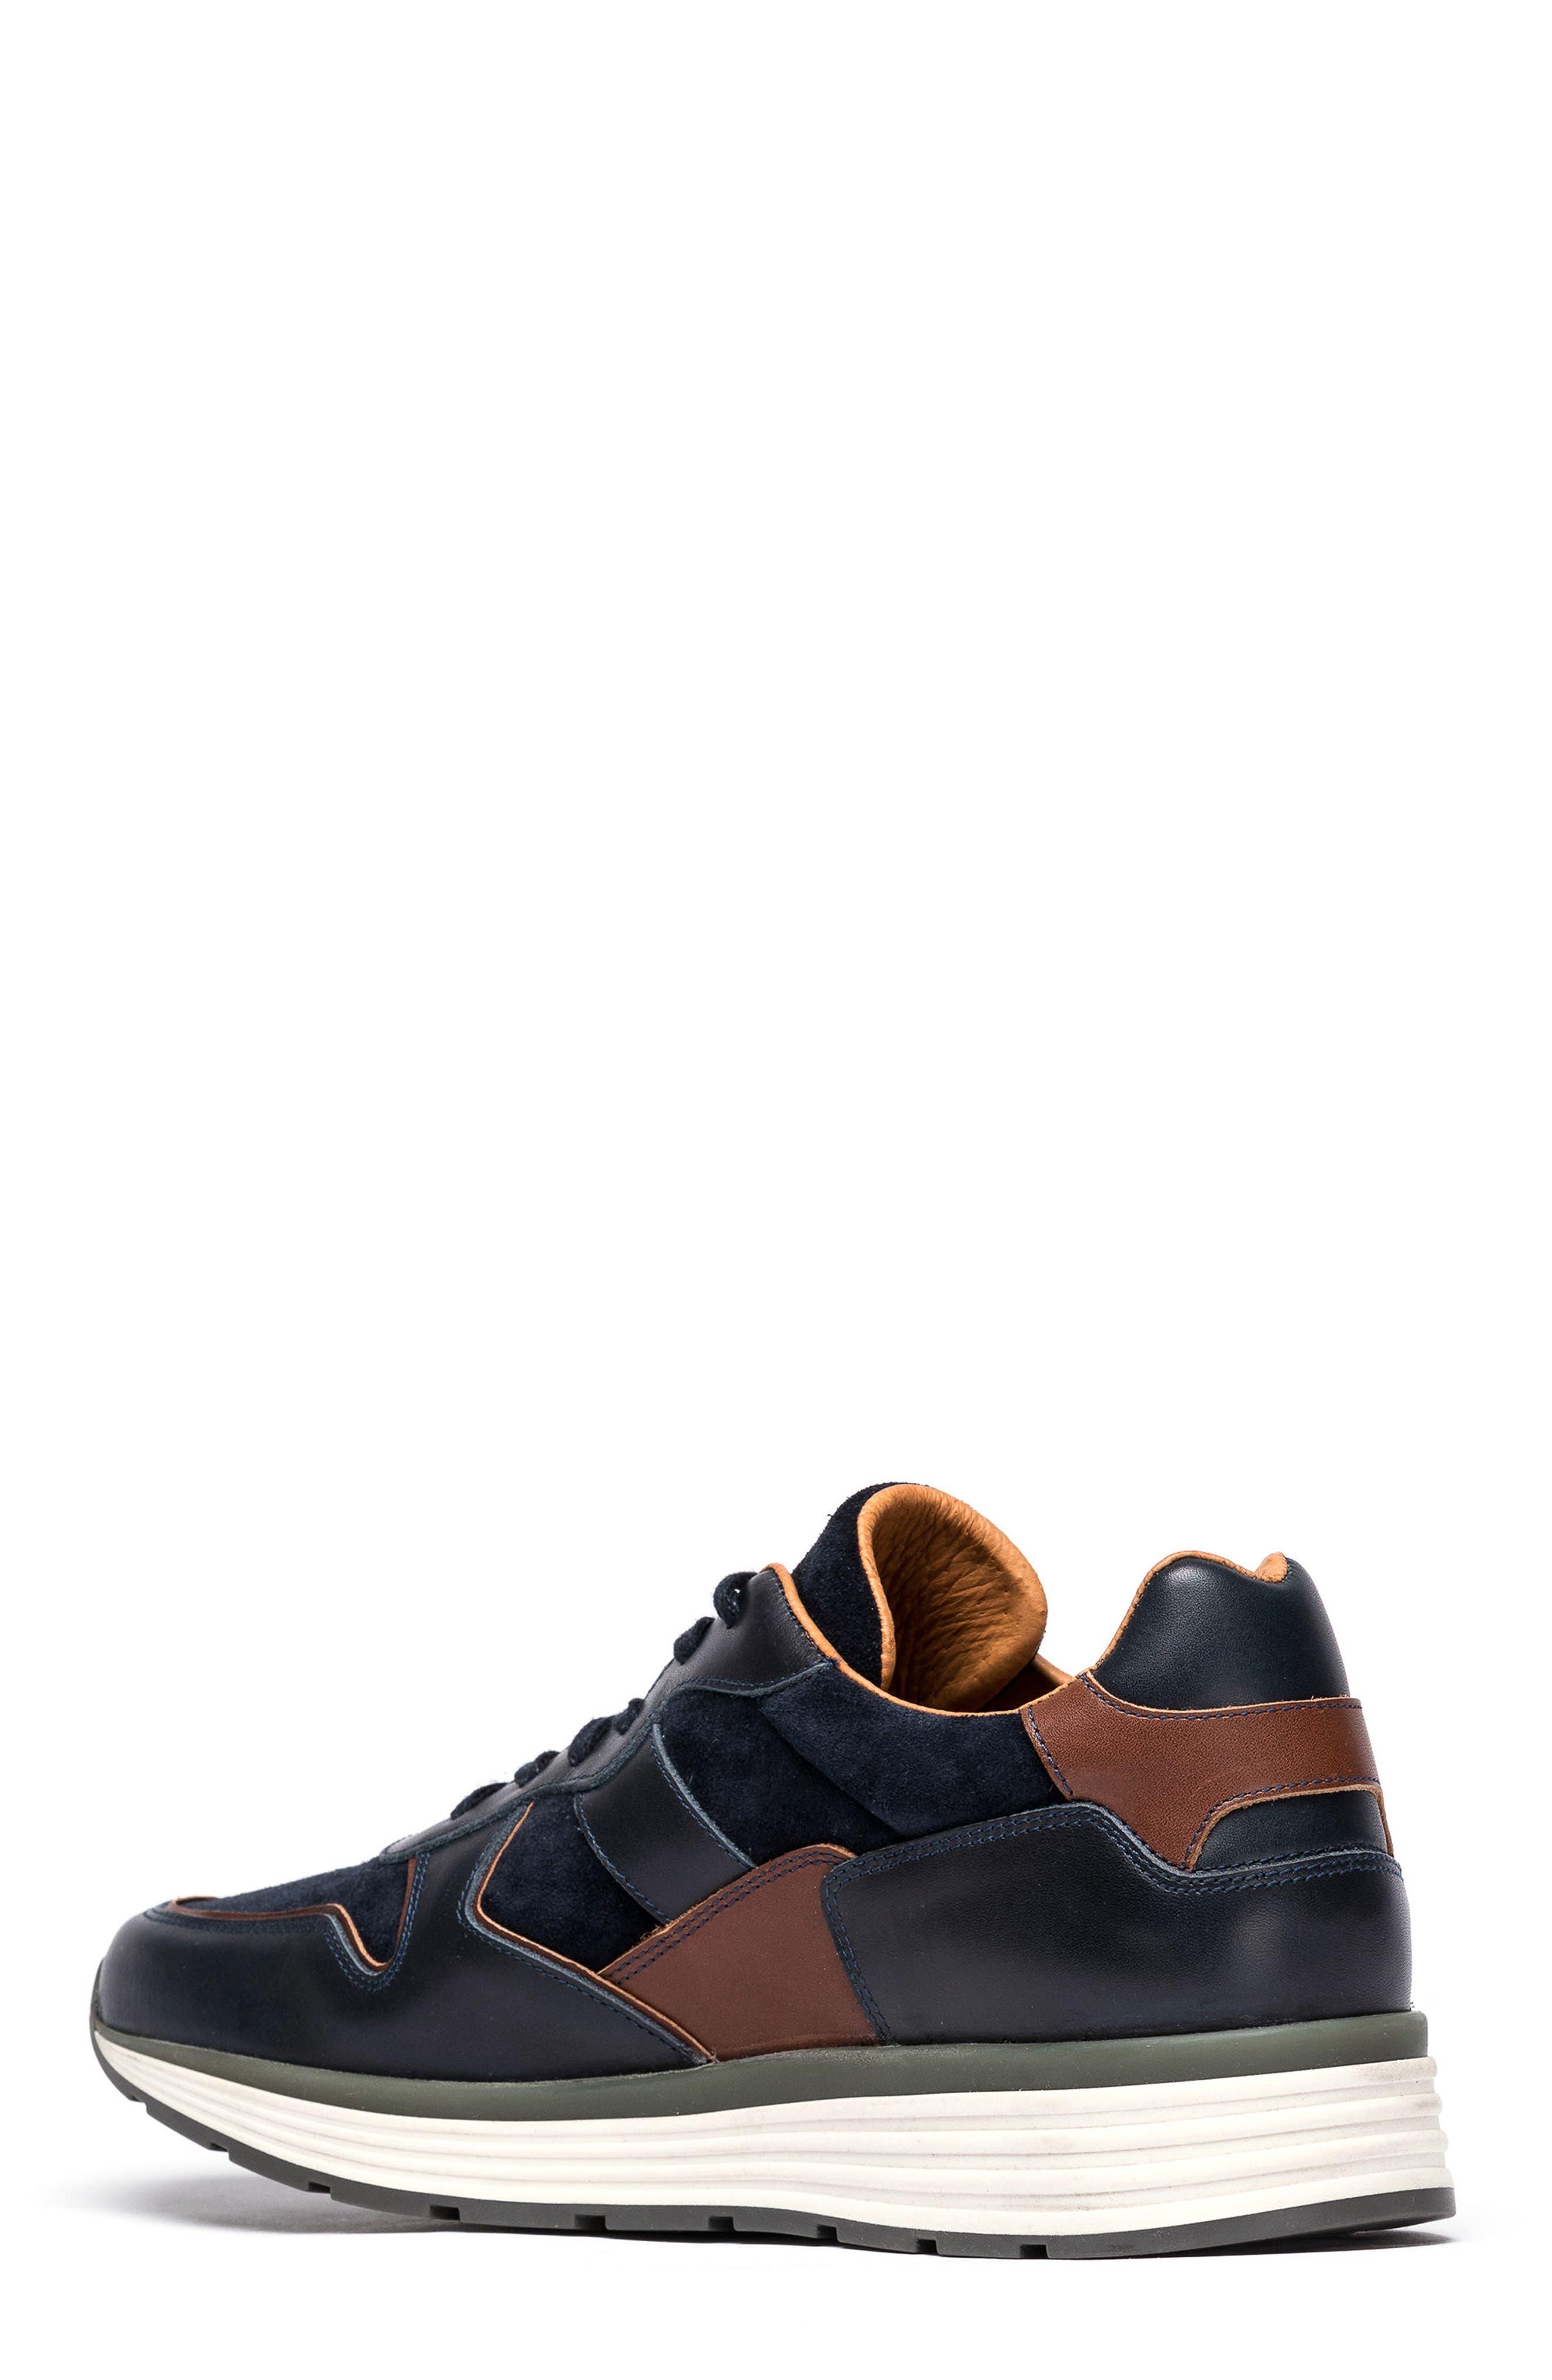 Hickory Sneaker,                             Alternate thumbnail 4, color,